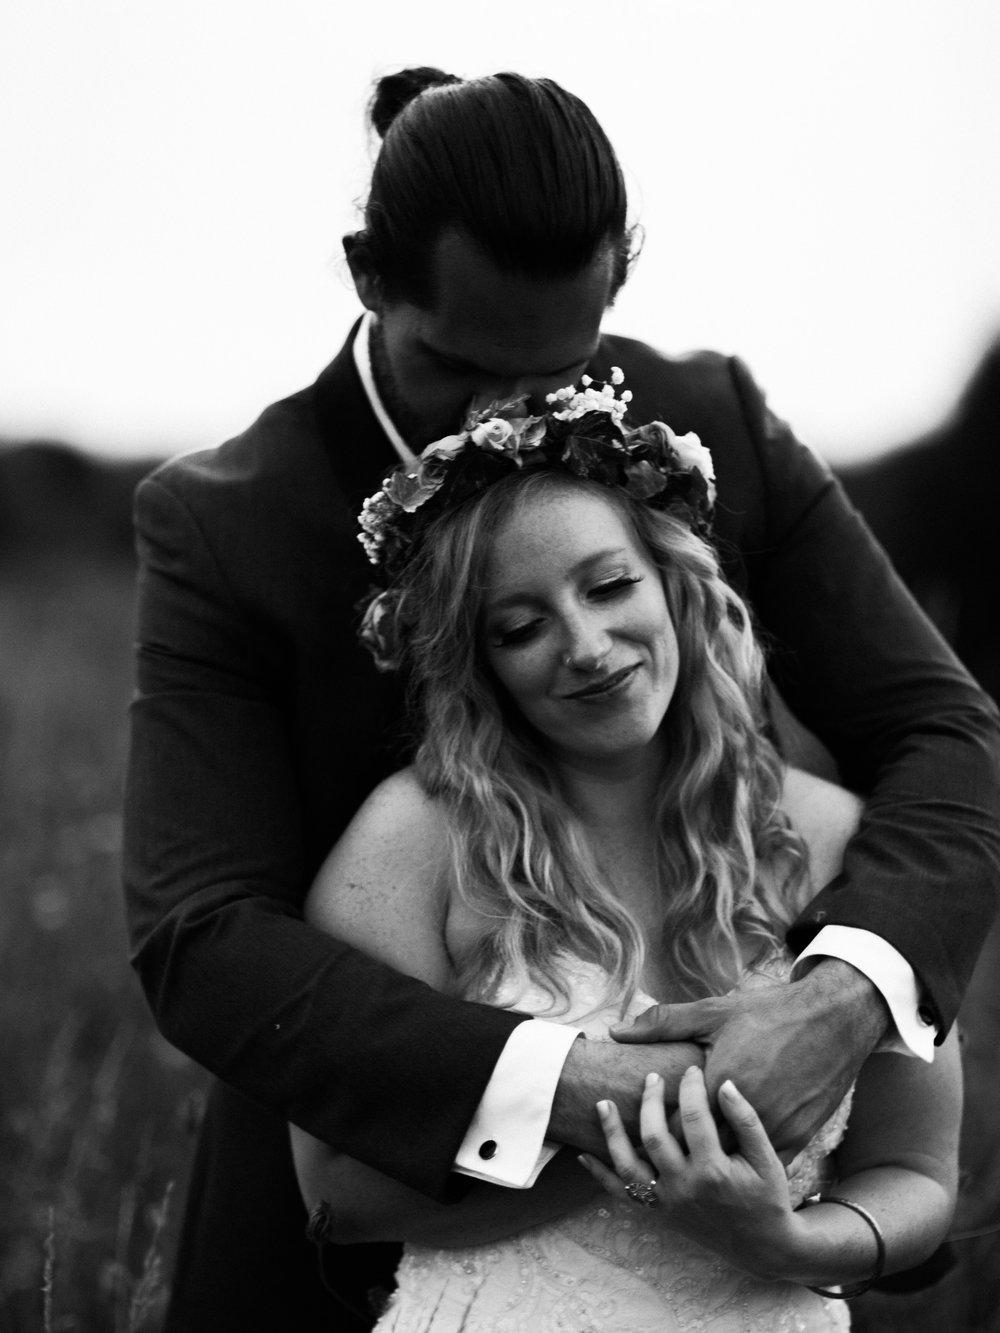 Fields-on-westlake-wedding-fiona-chiu-photography-50.jpg